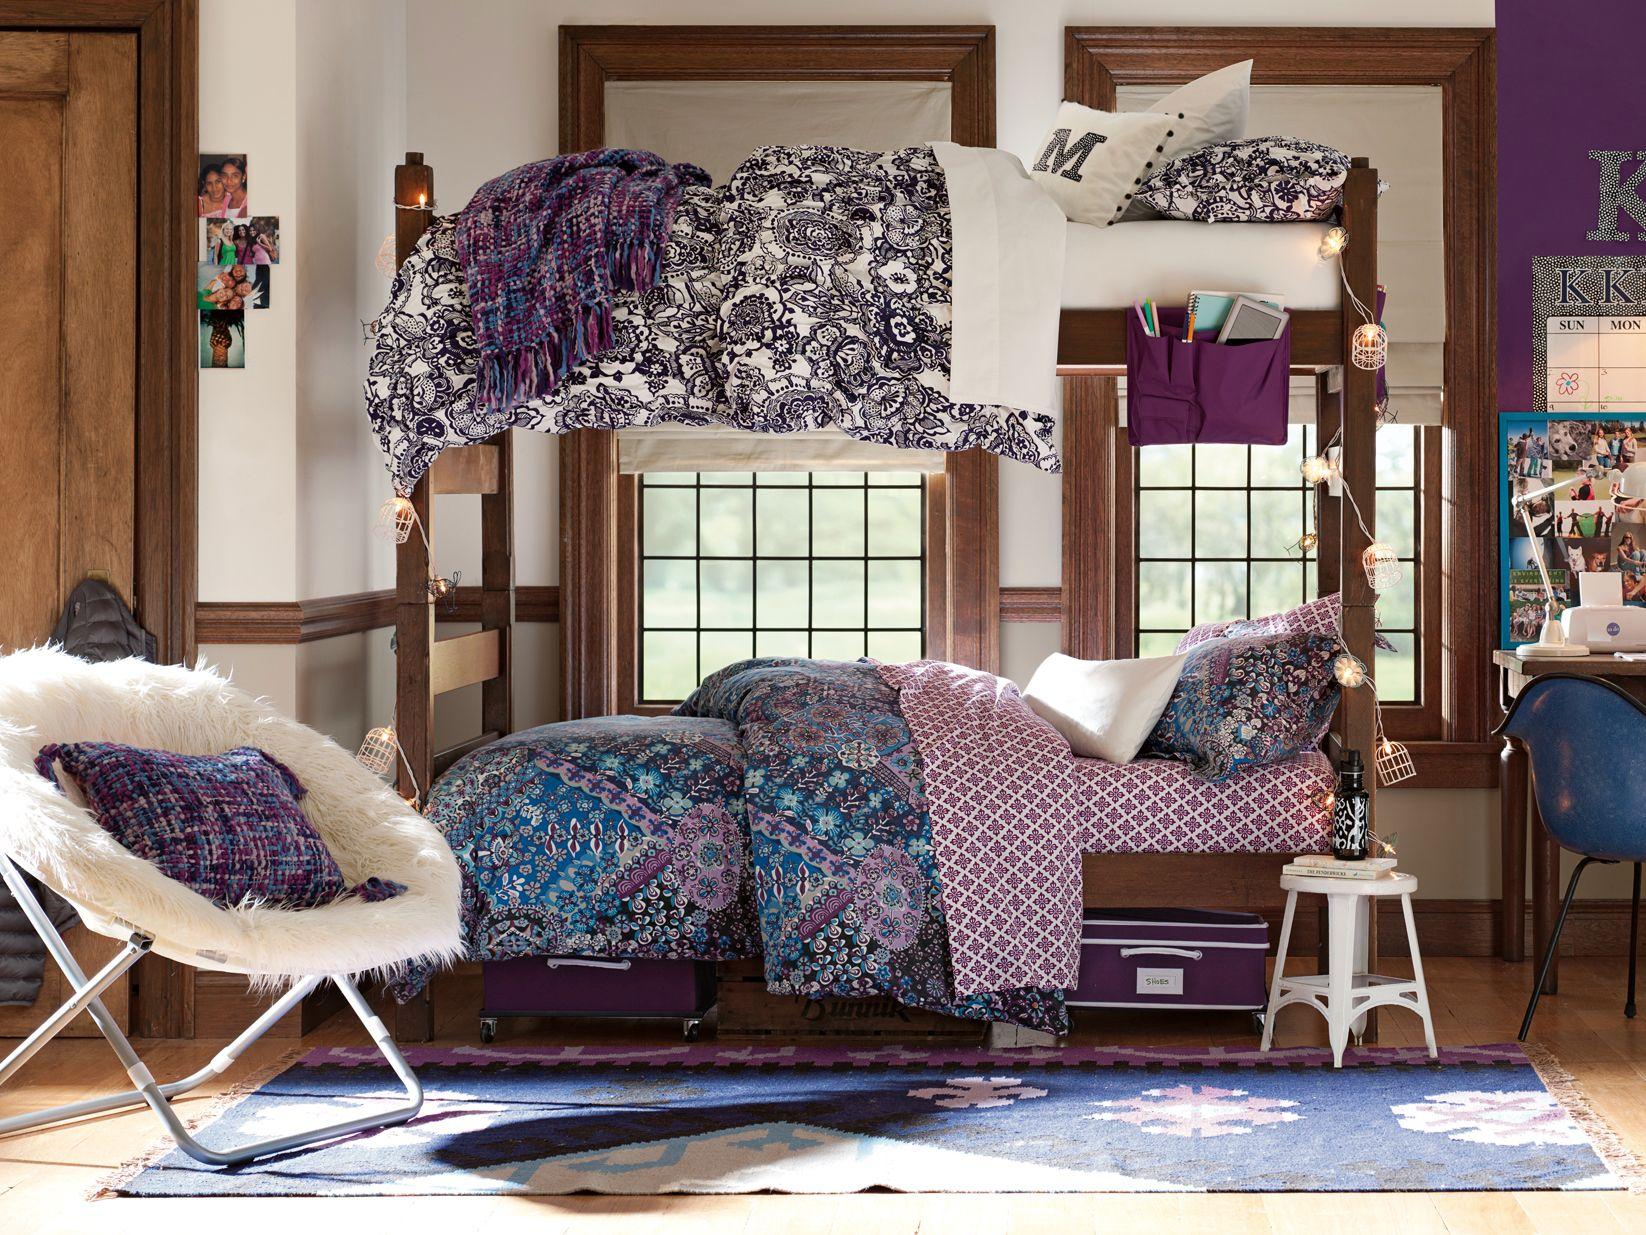 Javin loft bed with desk  Pin by Gina Grondin on Dorm Room  Pinterest  Dorm room Dorm and Room